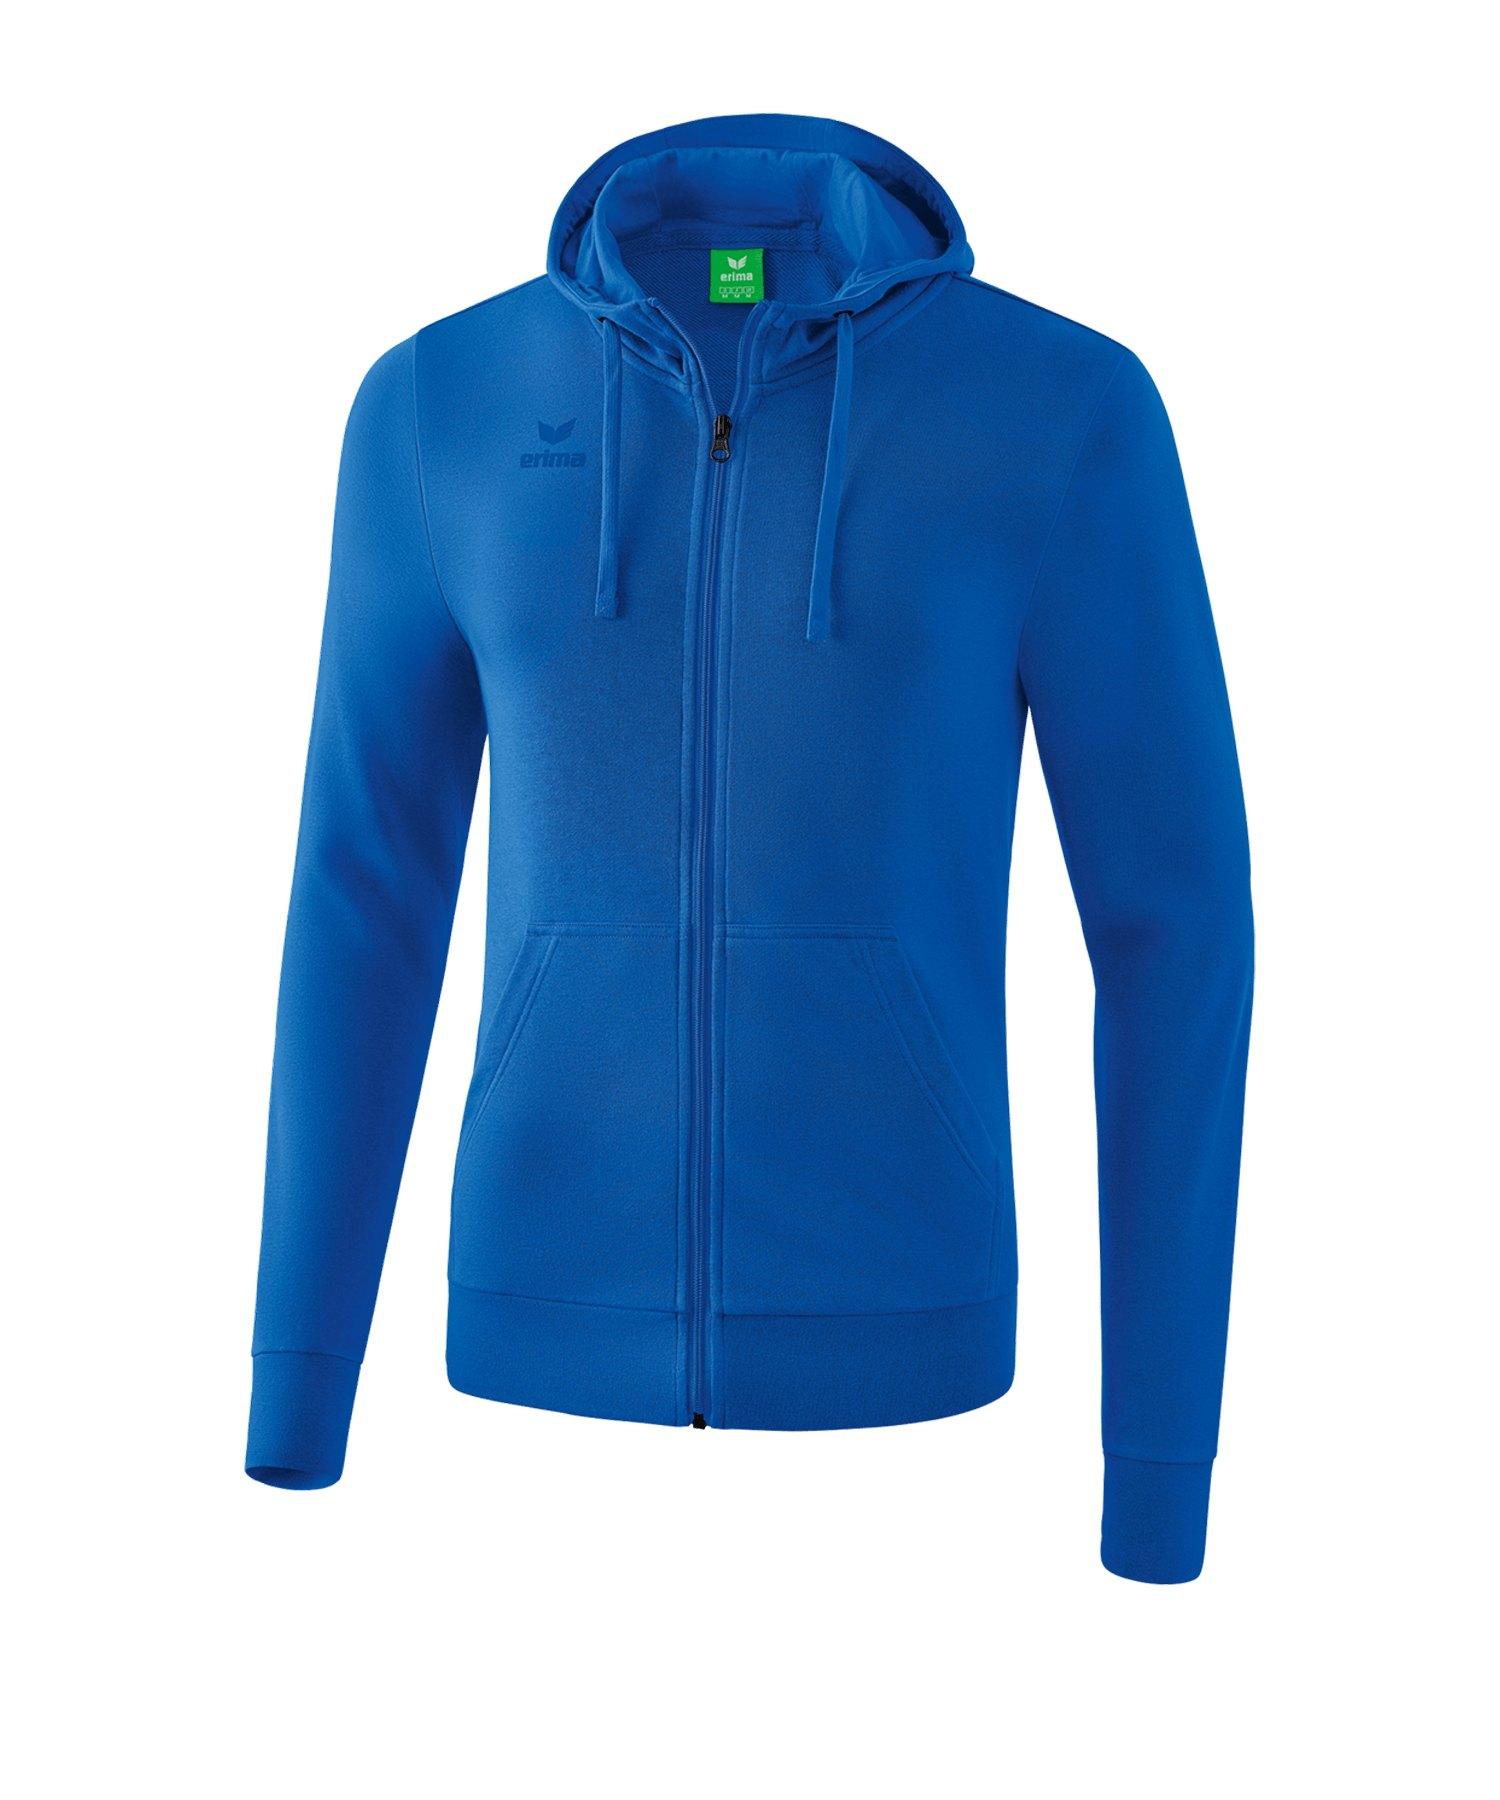 Erima Basic Kapuzenjacke Blau - blau